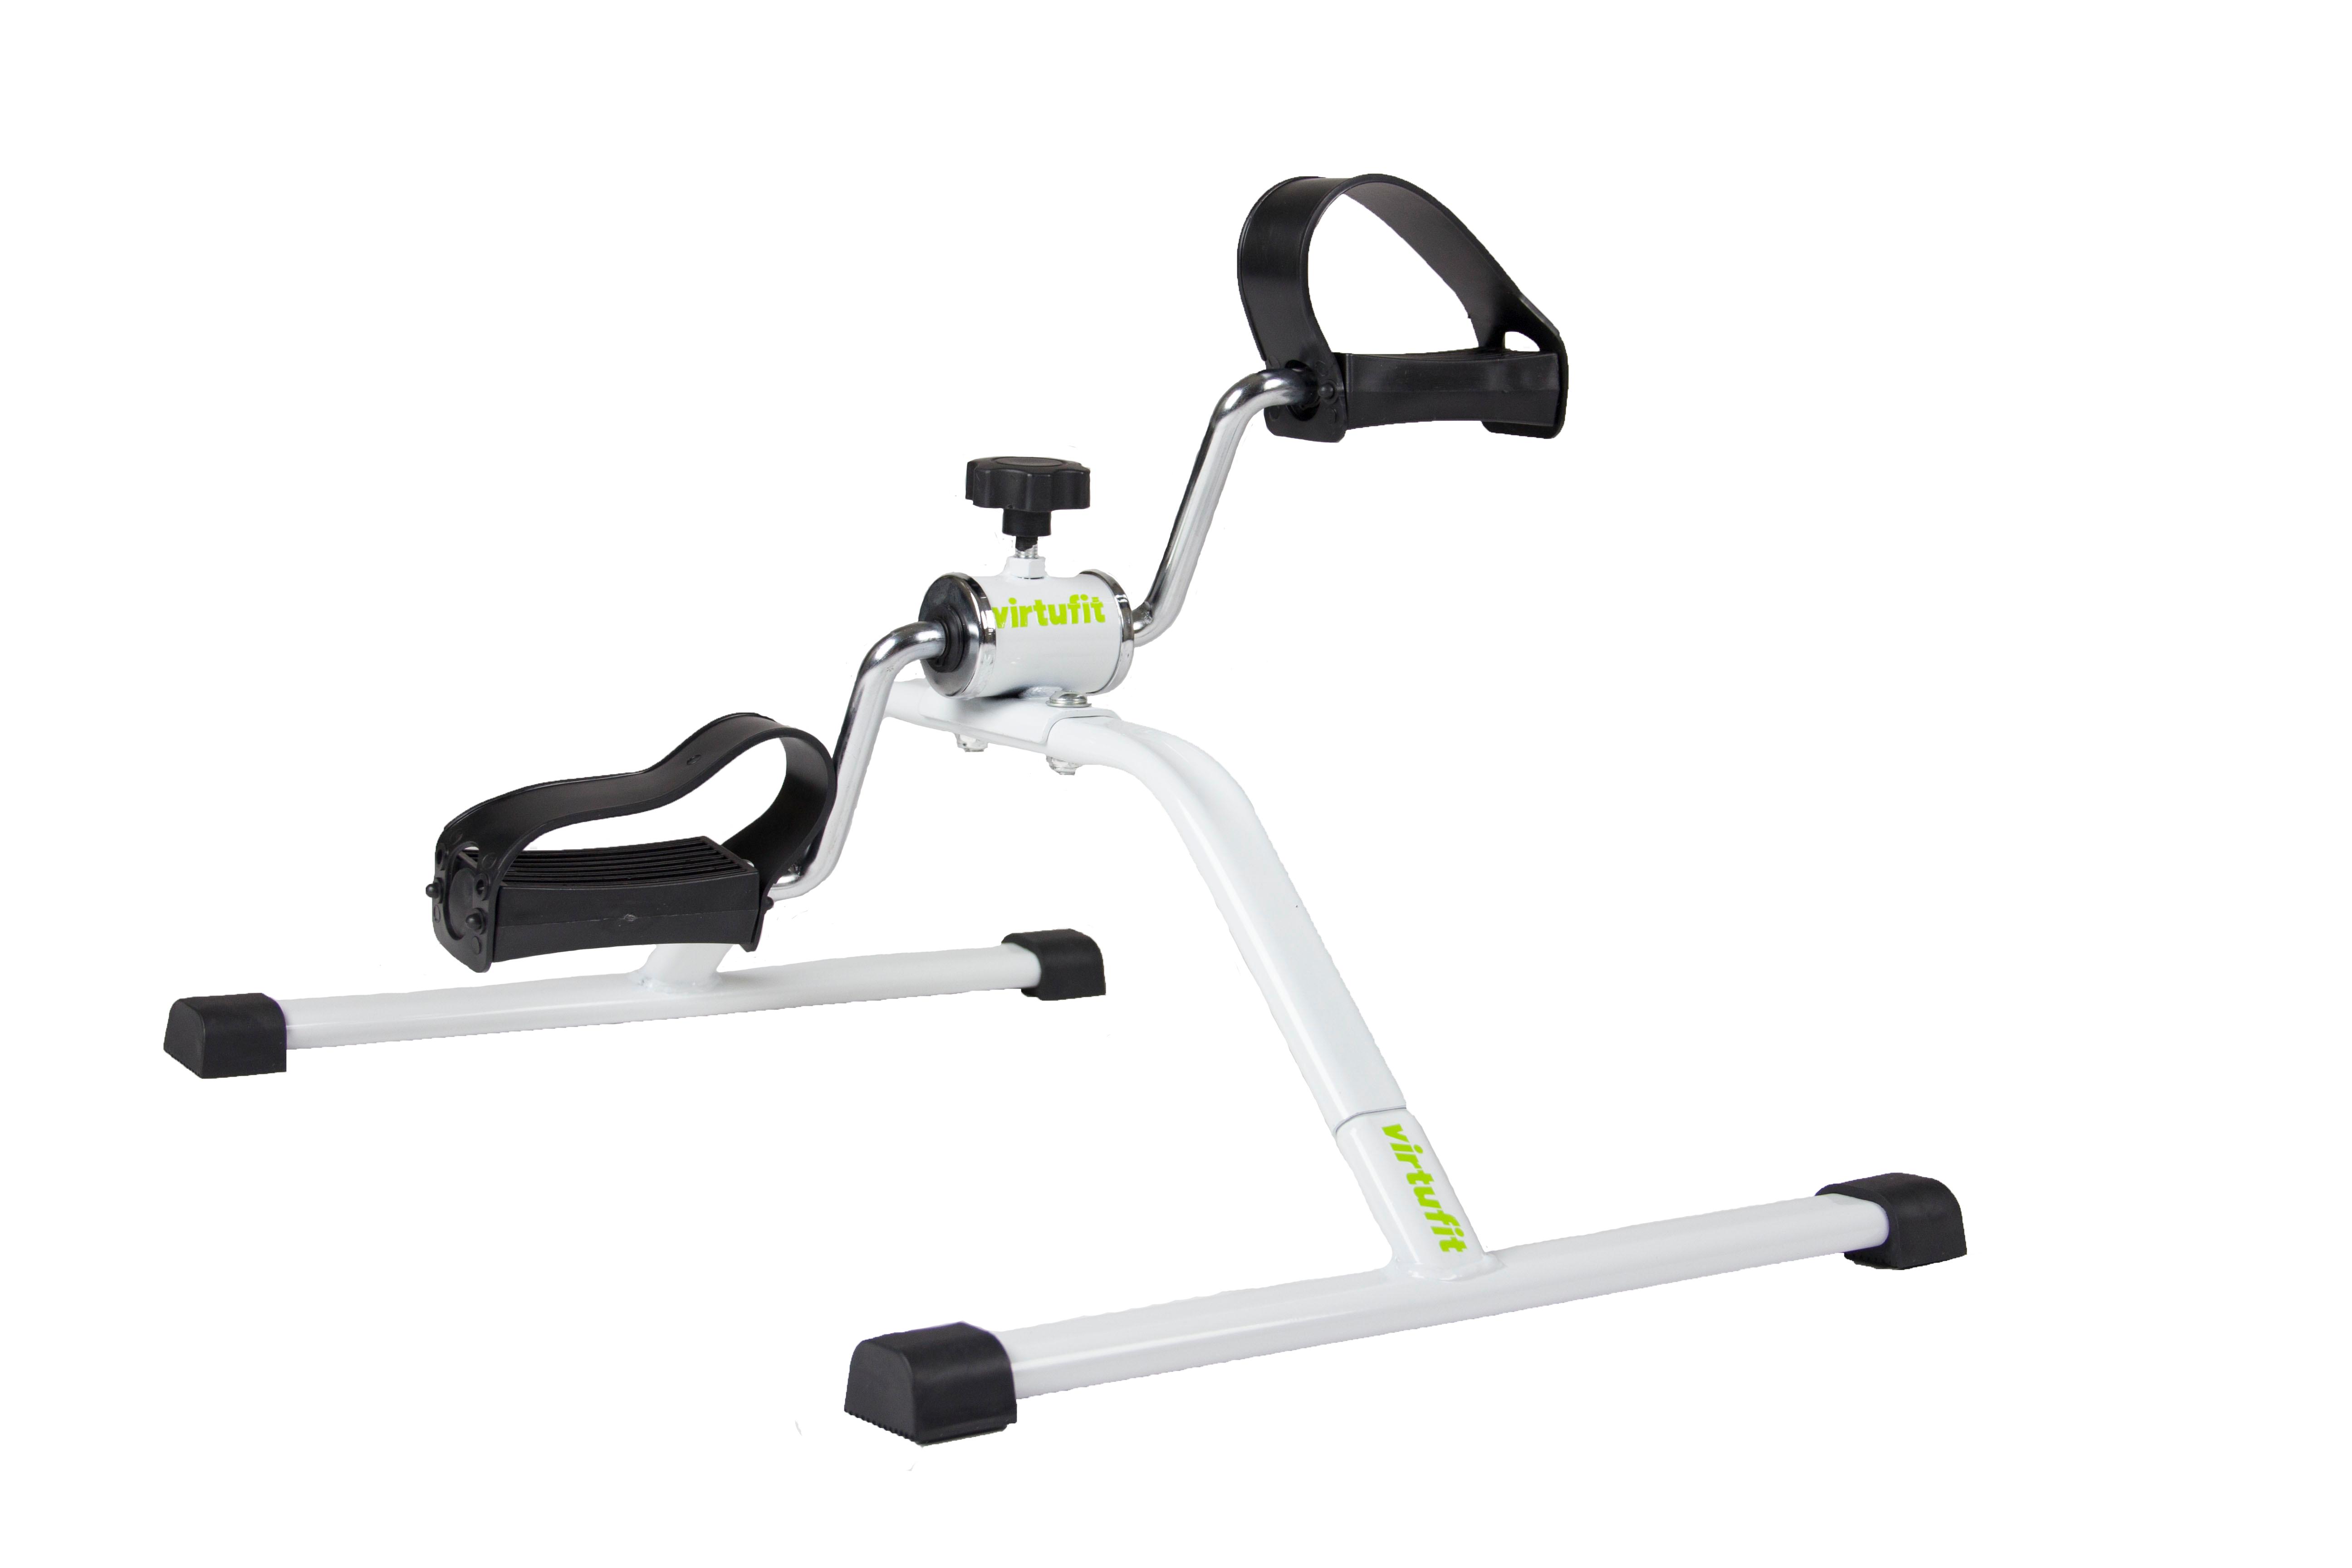 Virtufitfitnessapparaten  - VirtuFit V1 Stoelfiets Bewegingstrainer